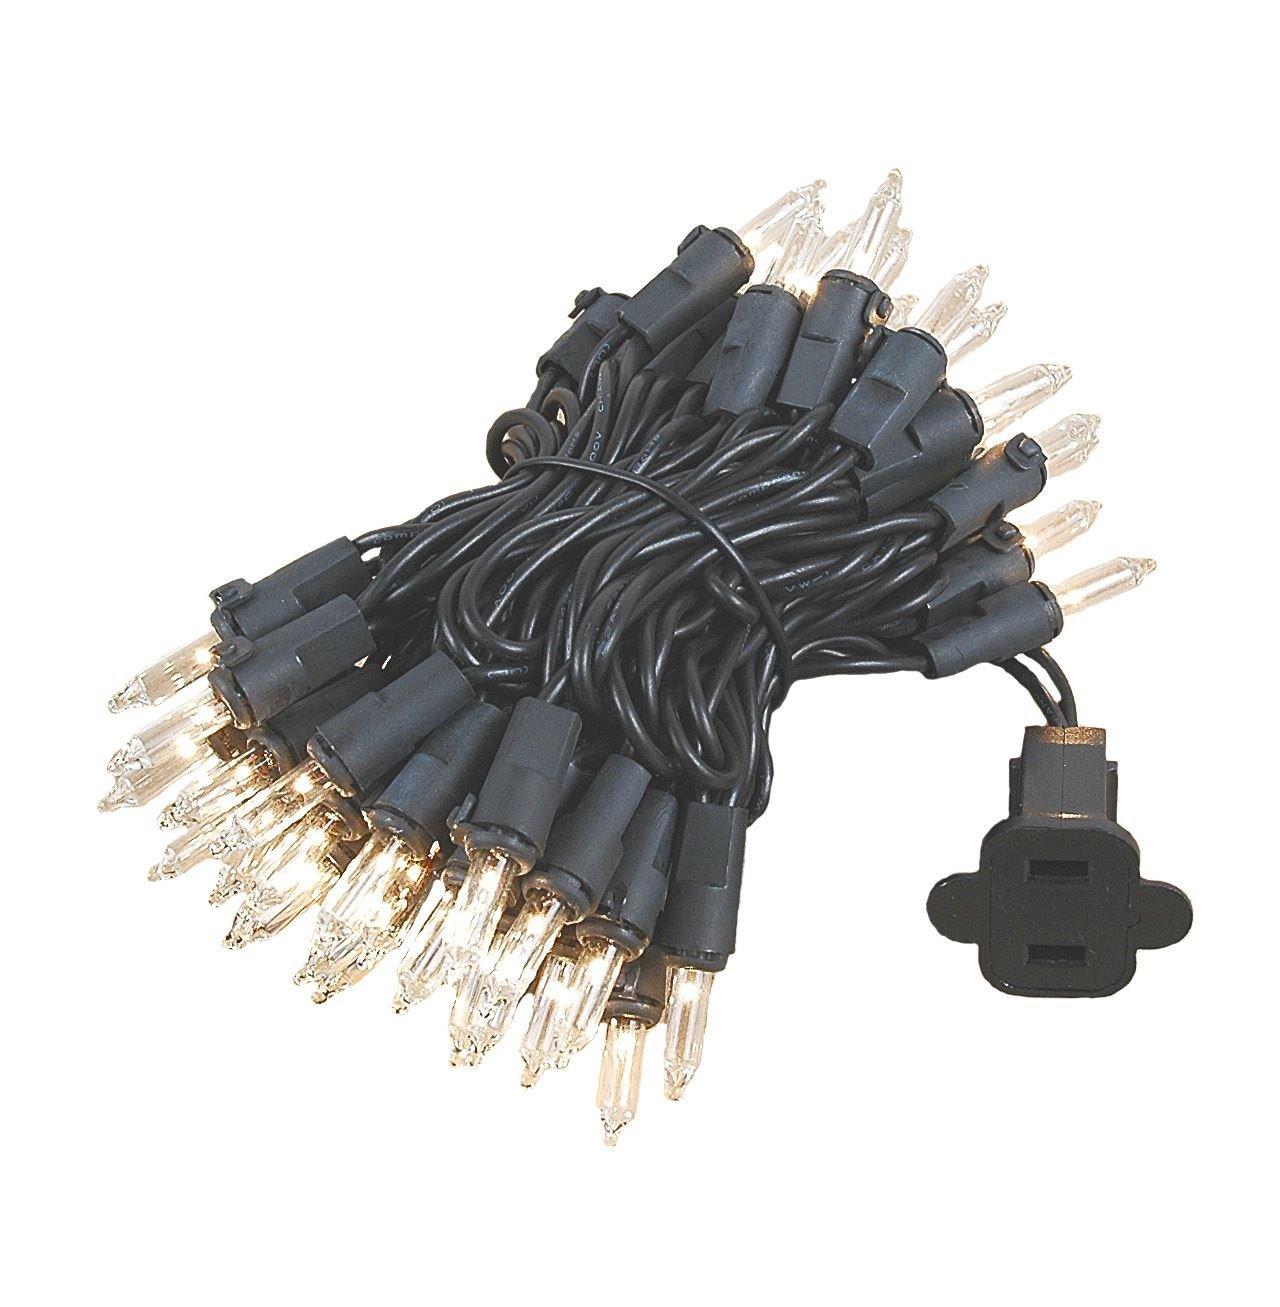 Novelty Lights 50 Light Clear Christmas Mini Light Set Black Wire 11' Long